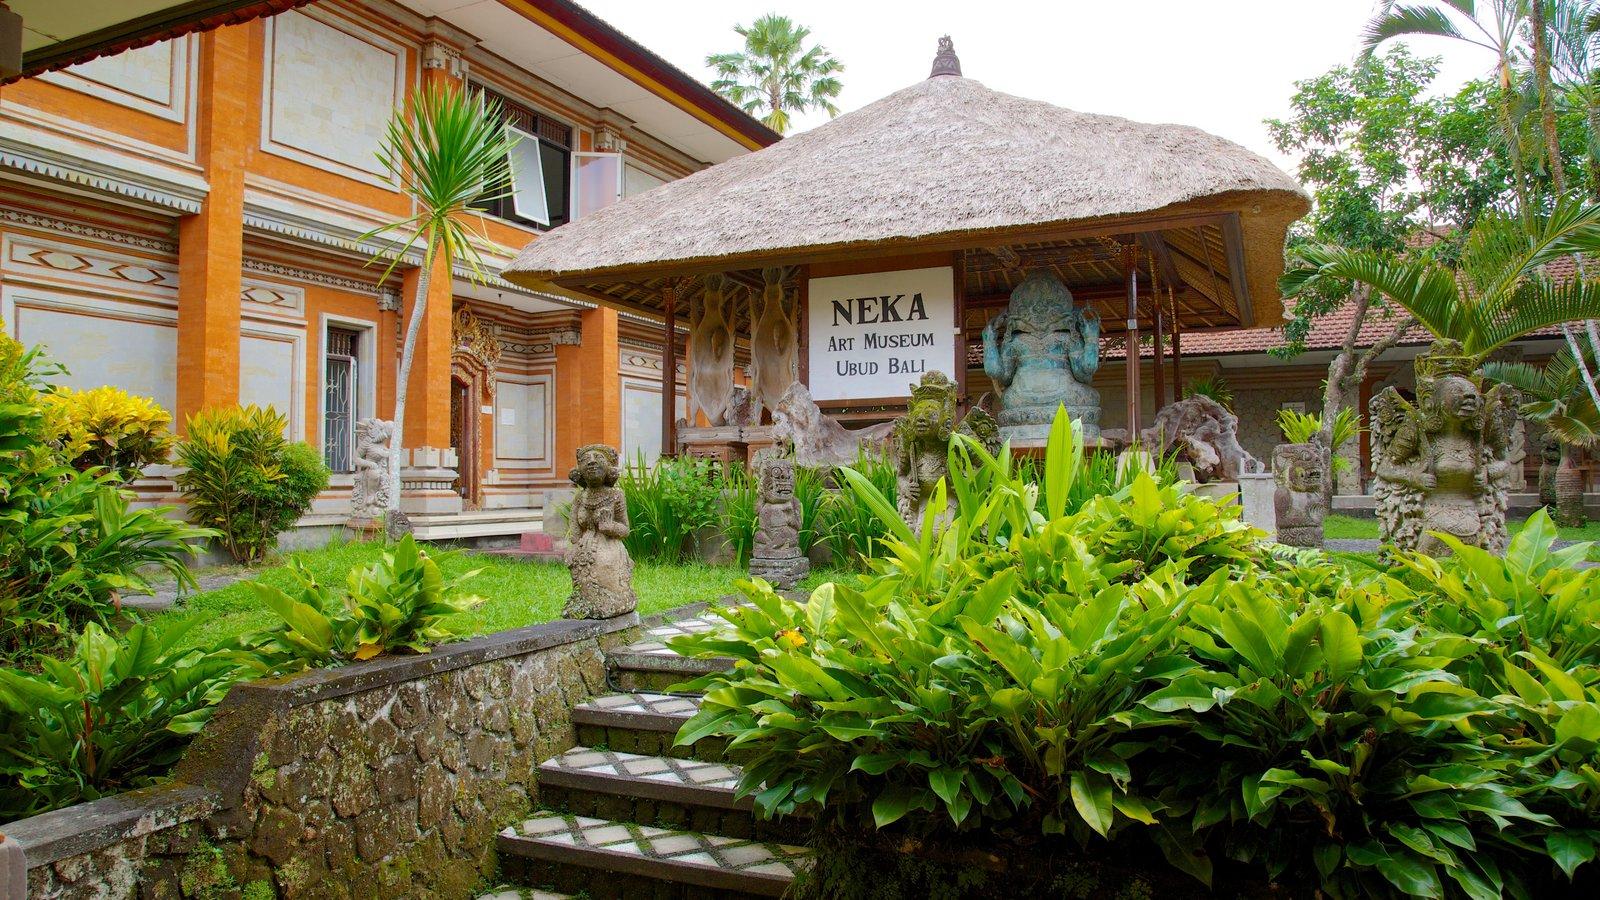 Neka Art Museum featuring art and a park